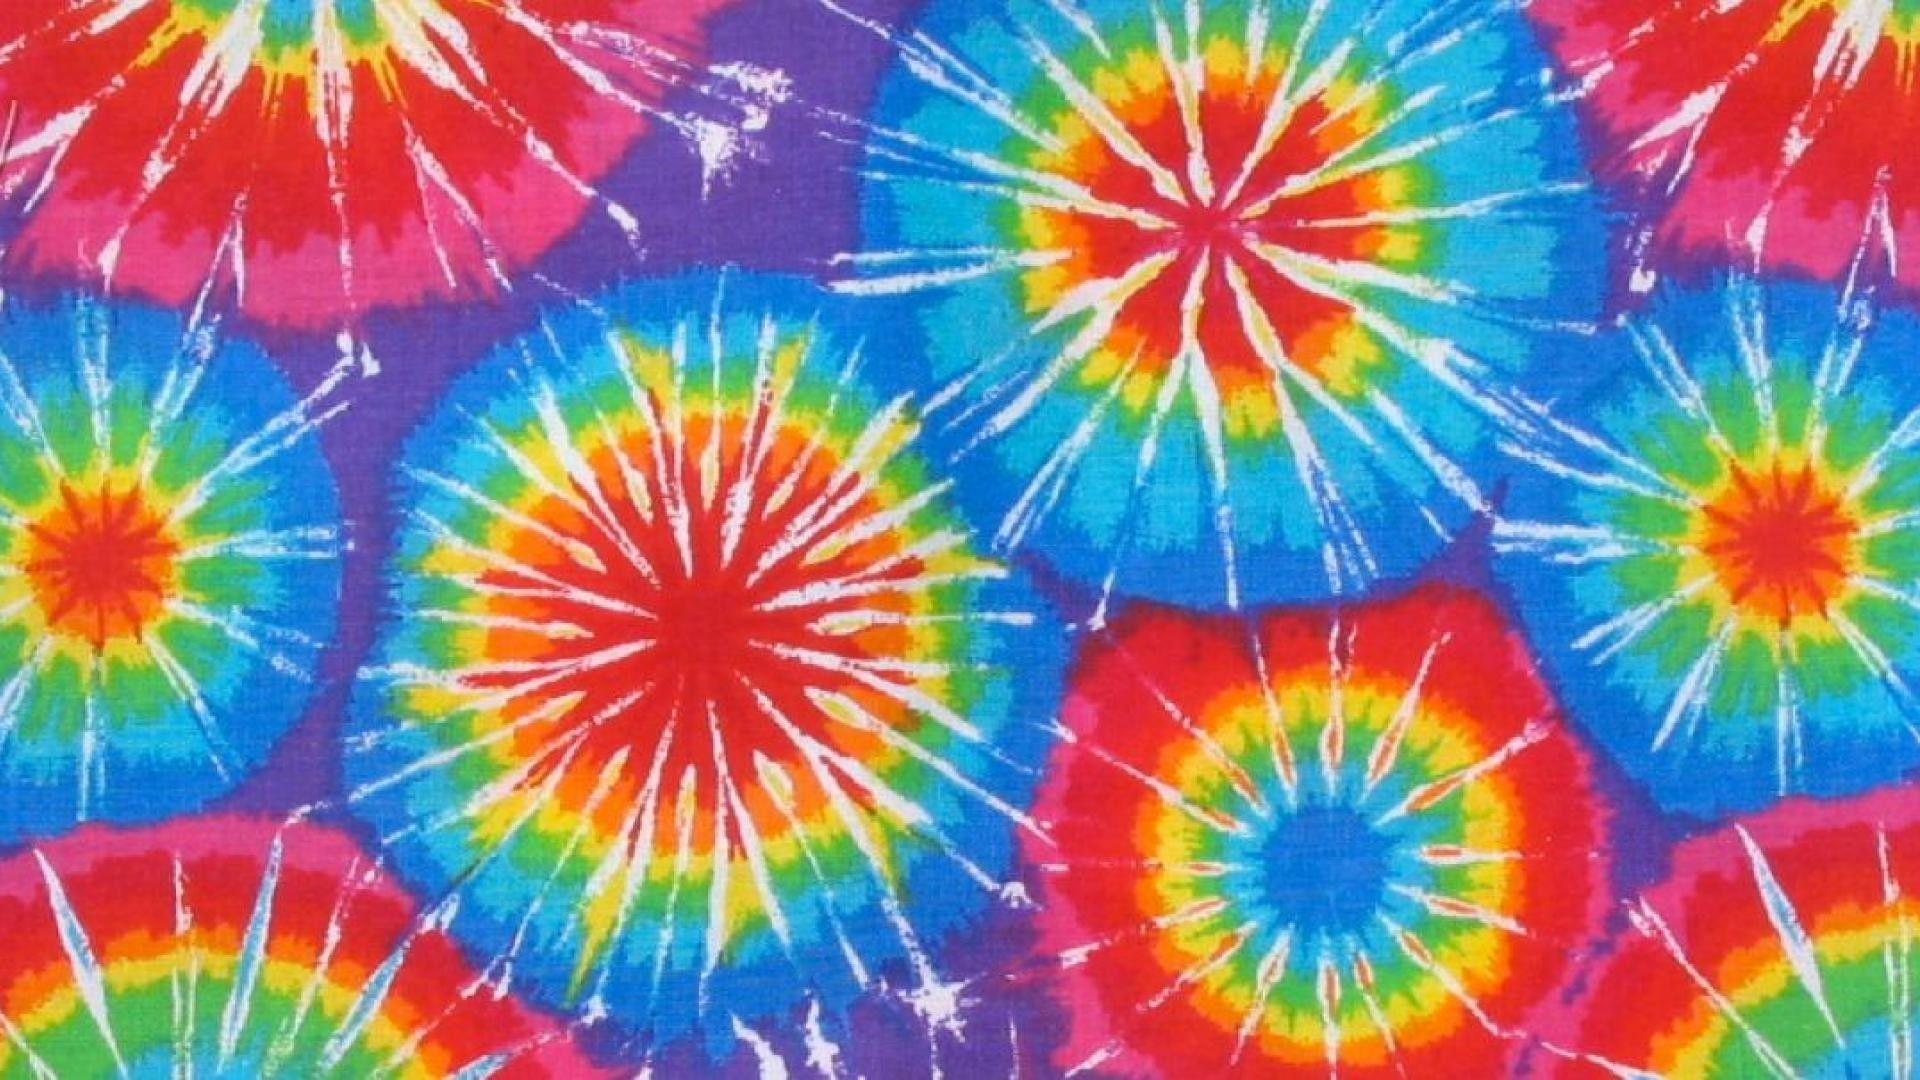 Res 1920x1080 Boho Desktop Wallpaper 9 Tie Dye Wallpaper Hippie Wallpaper Tie Dye Background